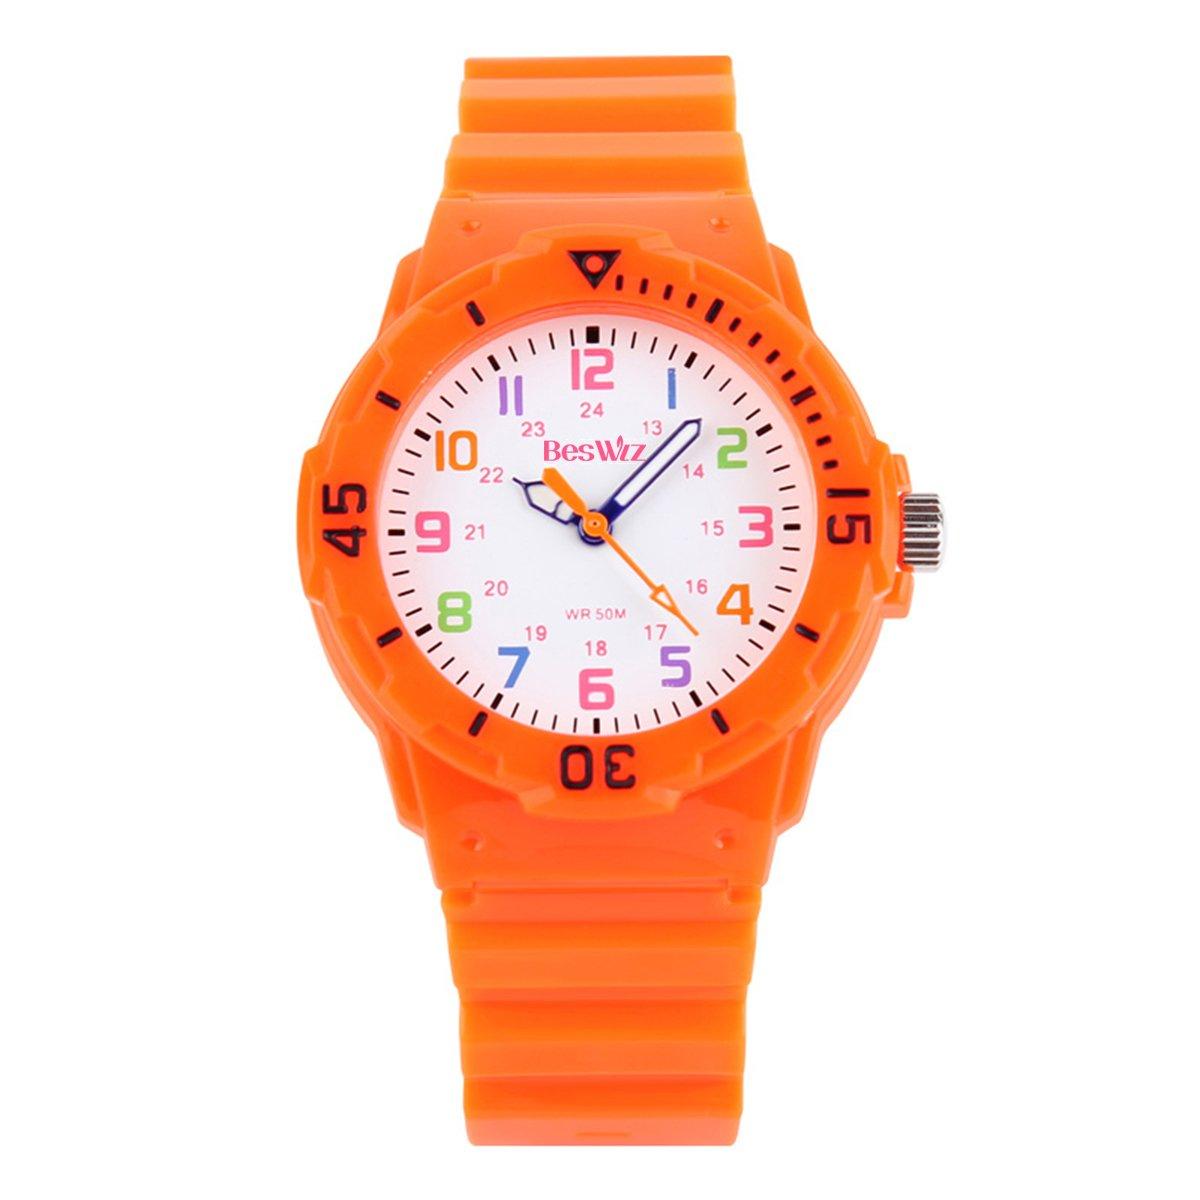 Kids Watches 50M Daily Waterproof Time Teacher Children Girly Boys Wrist Watch Orange